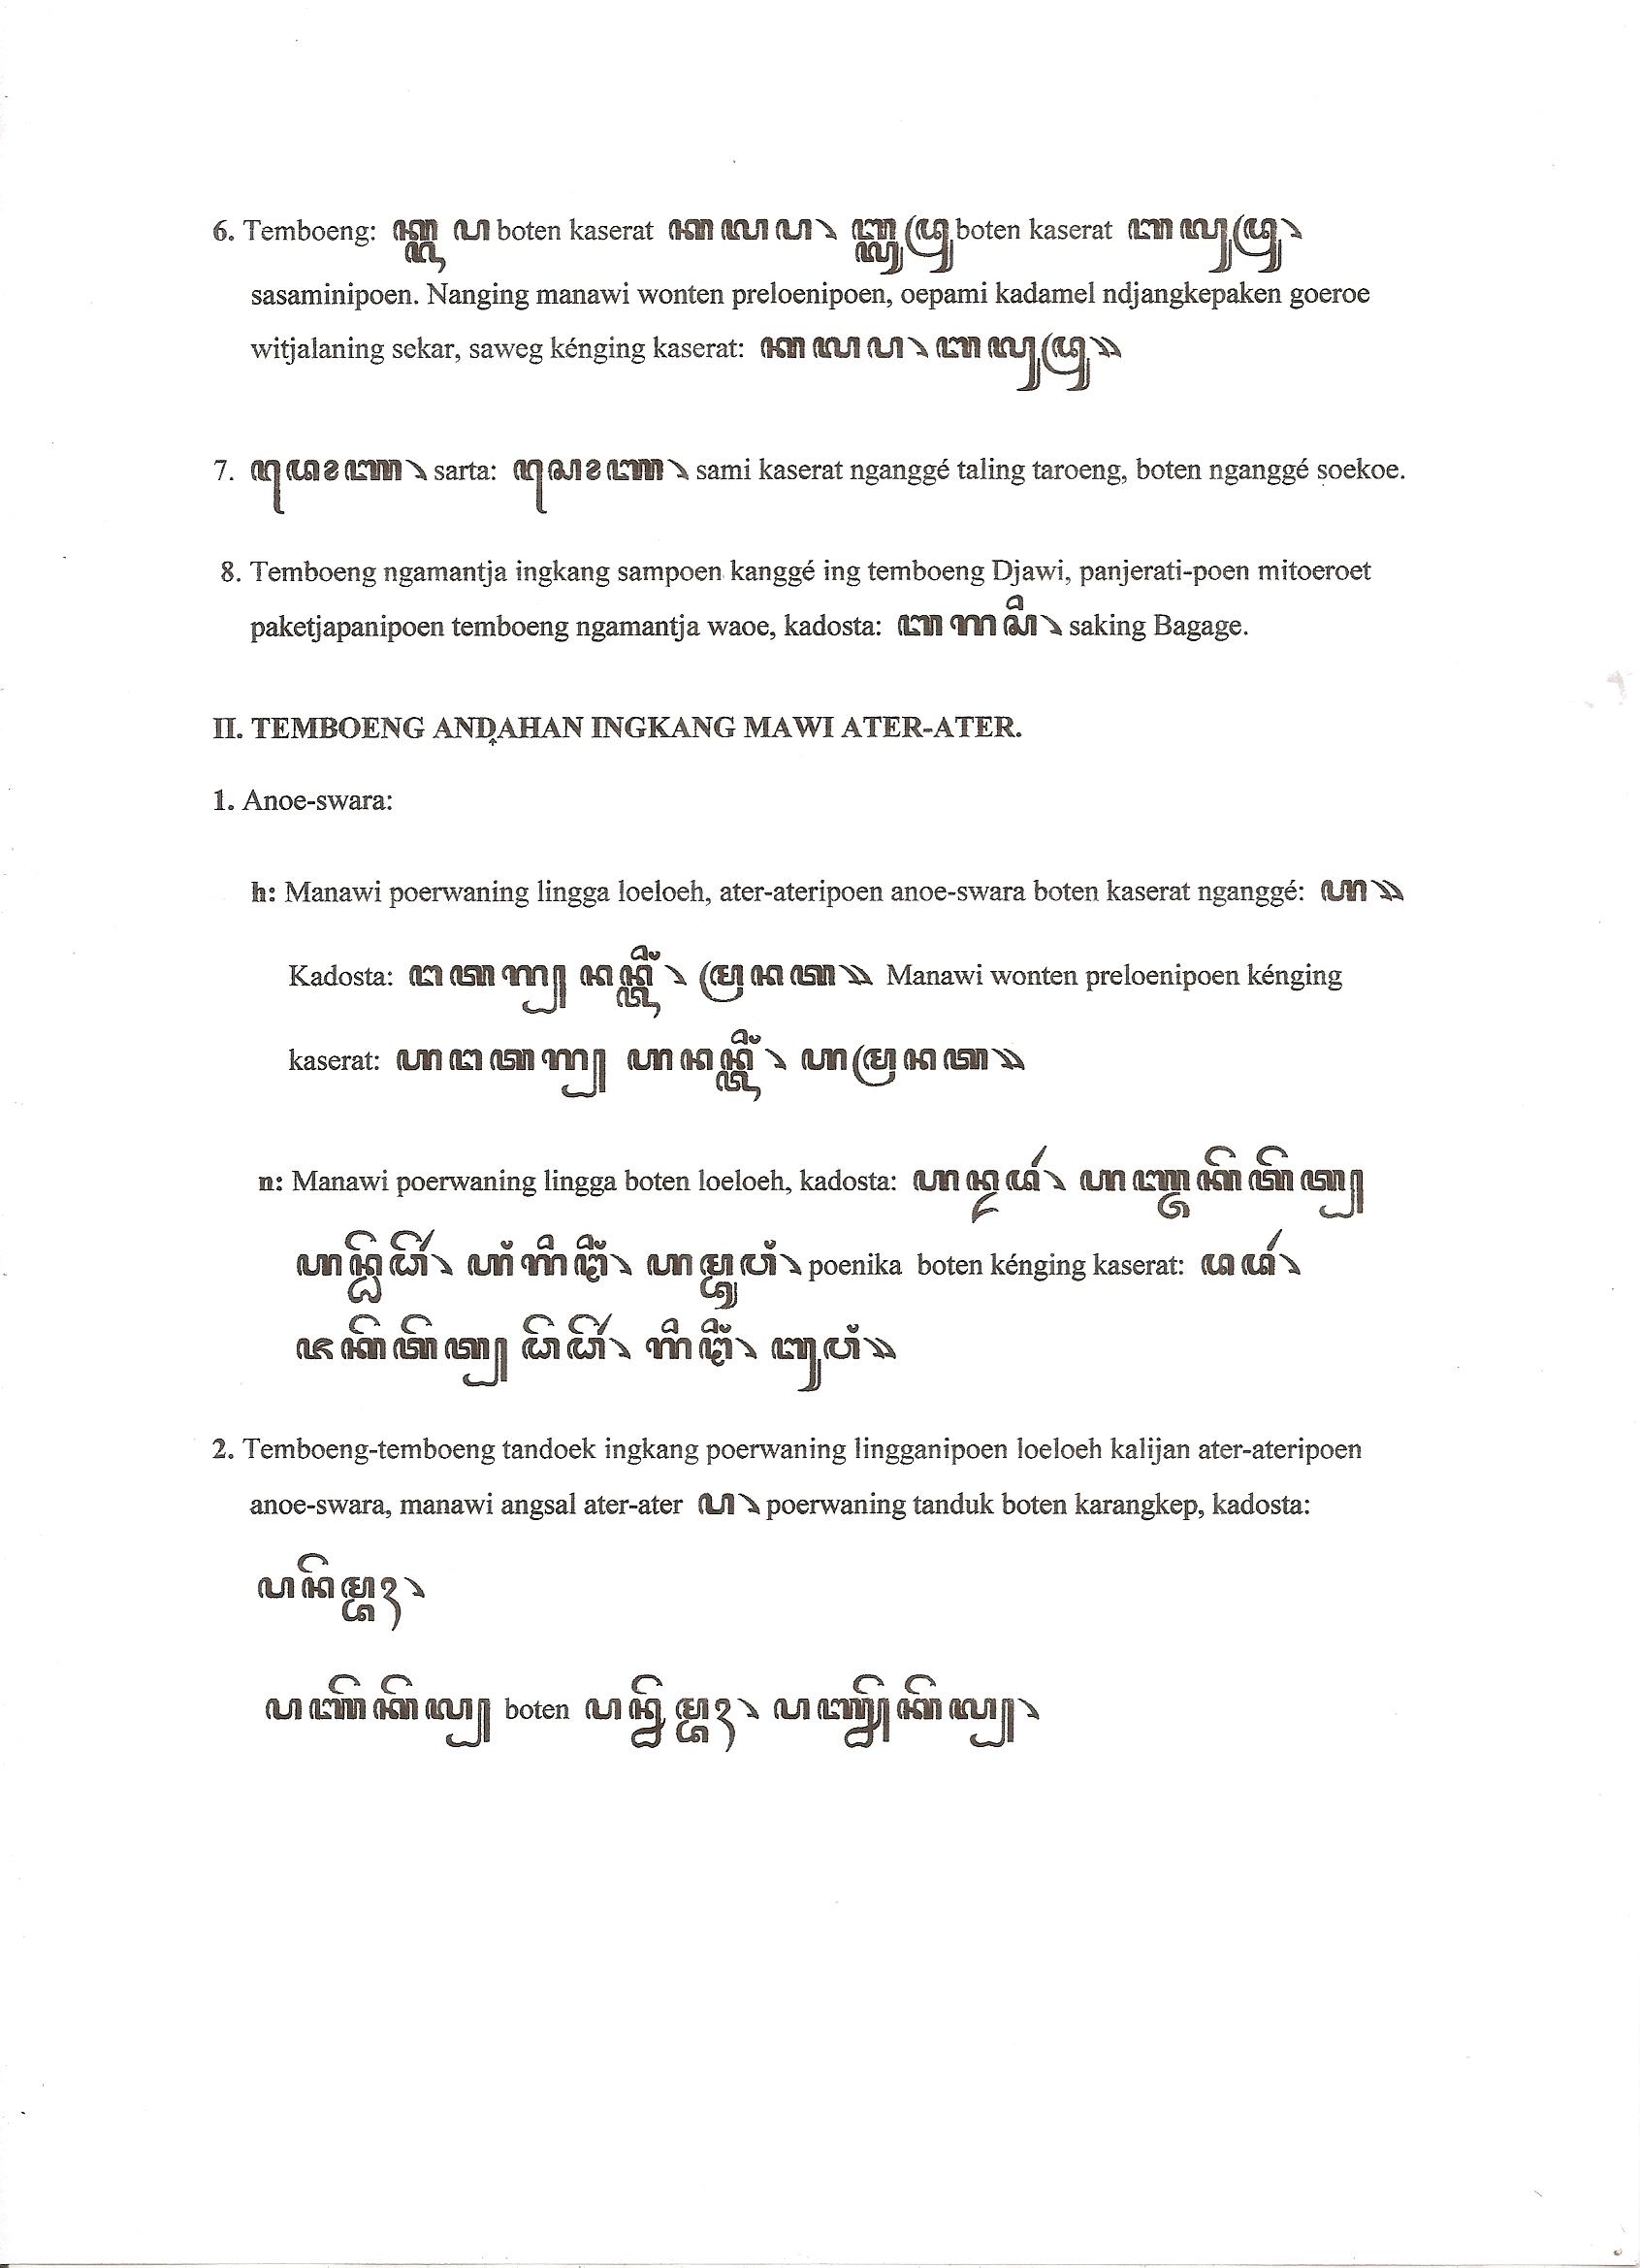 Aturan Penulisan Aksara Jawa 1 Spenagacajava